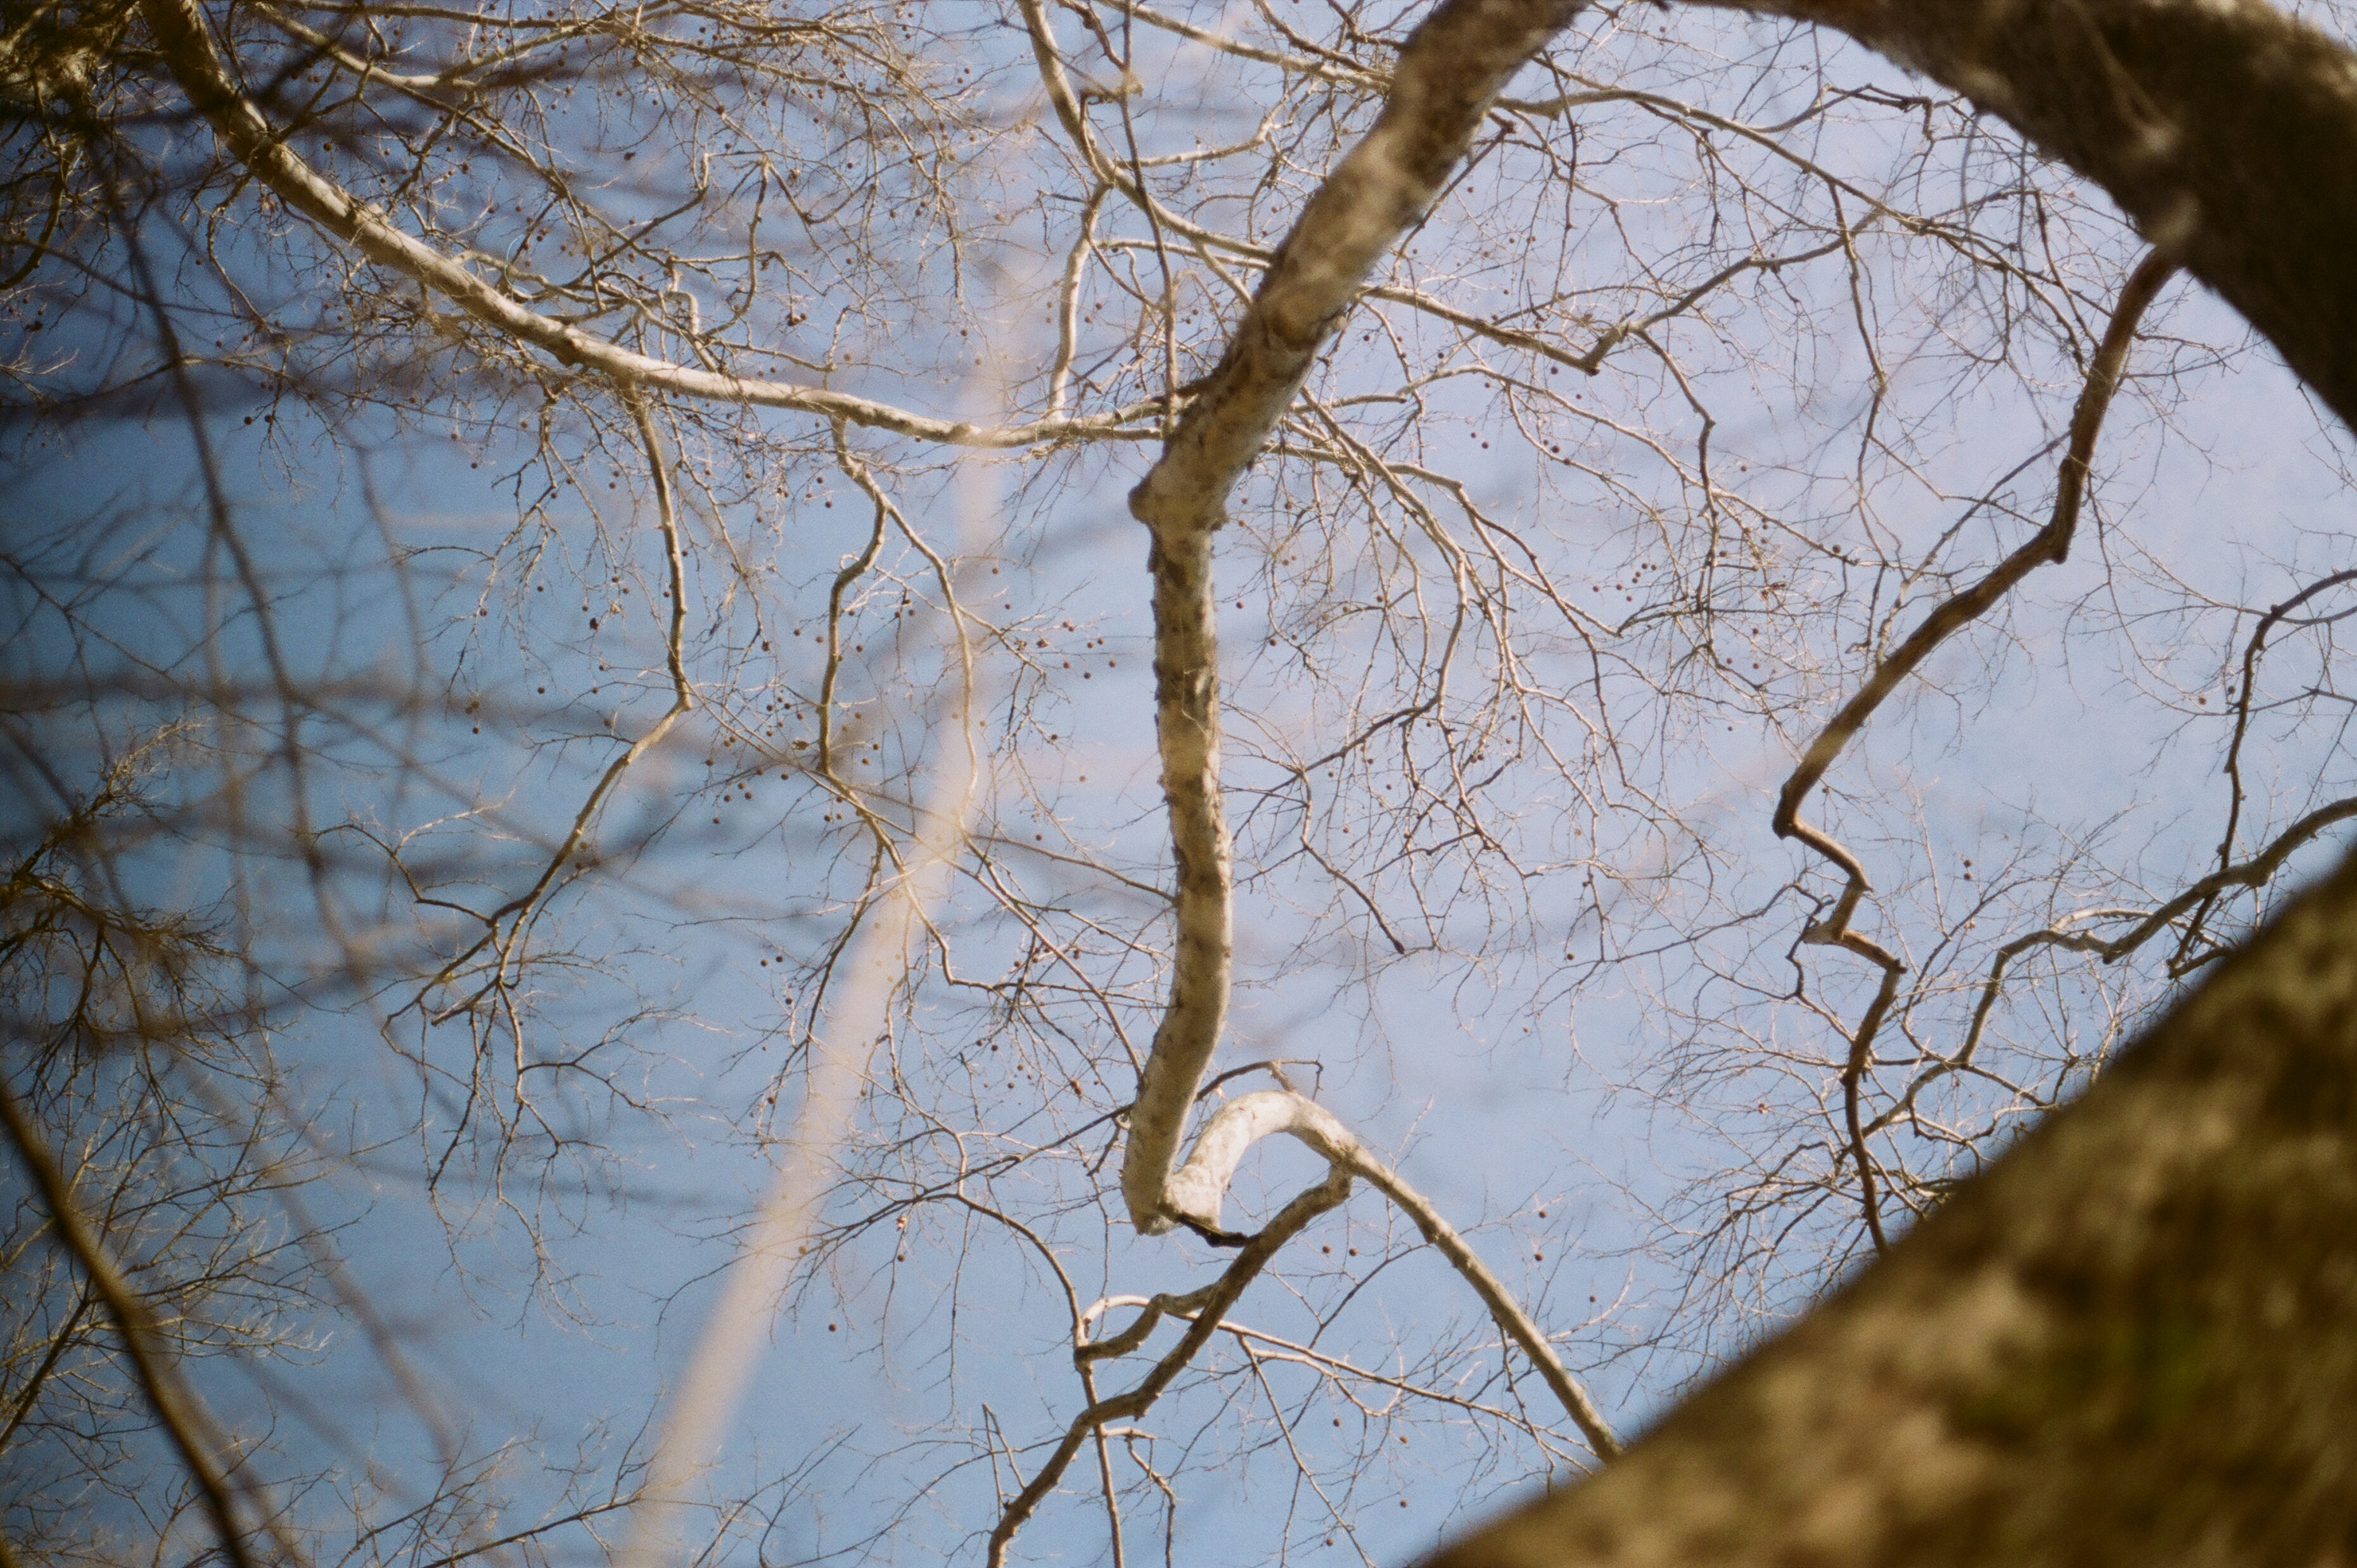 Adventures in Film Photography: Winter in Ohio